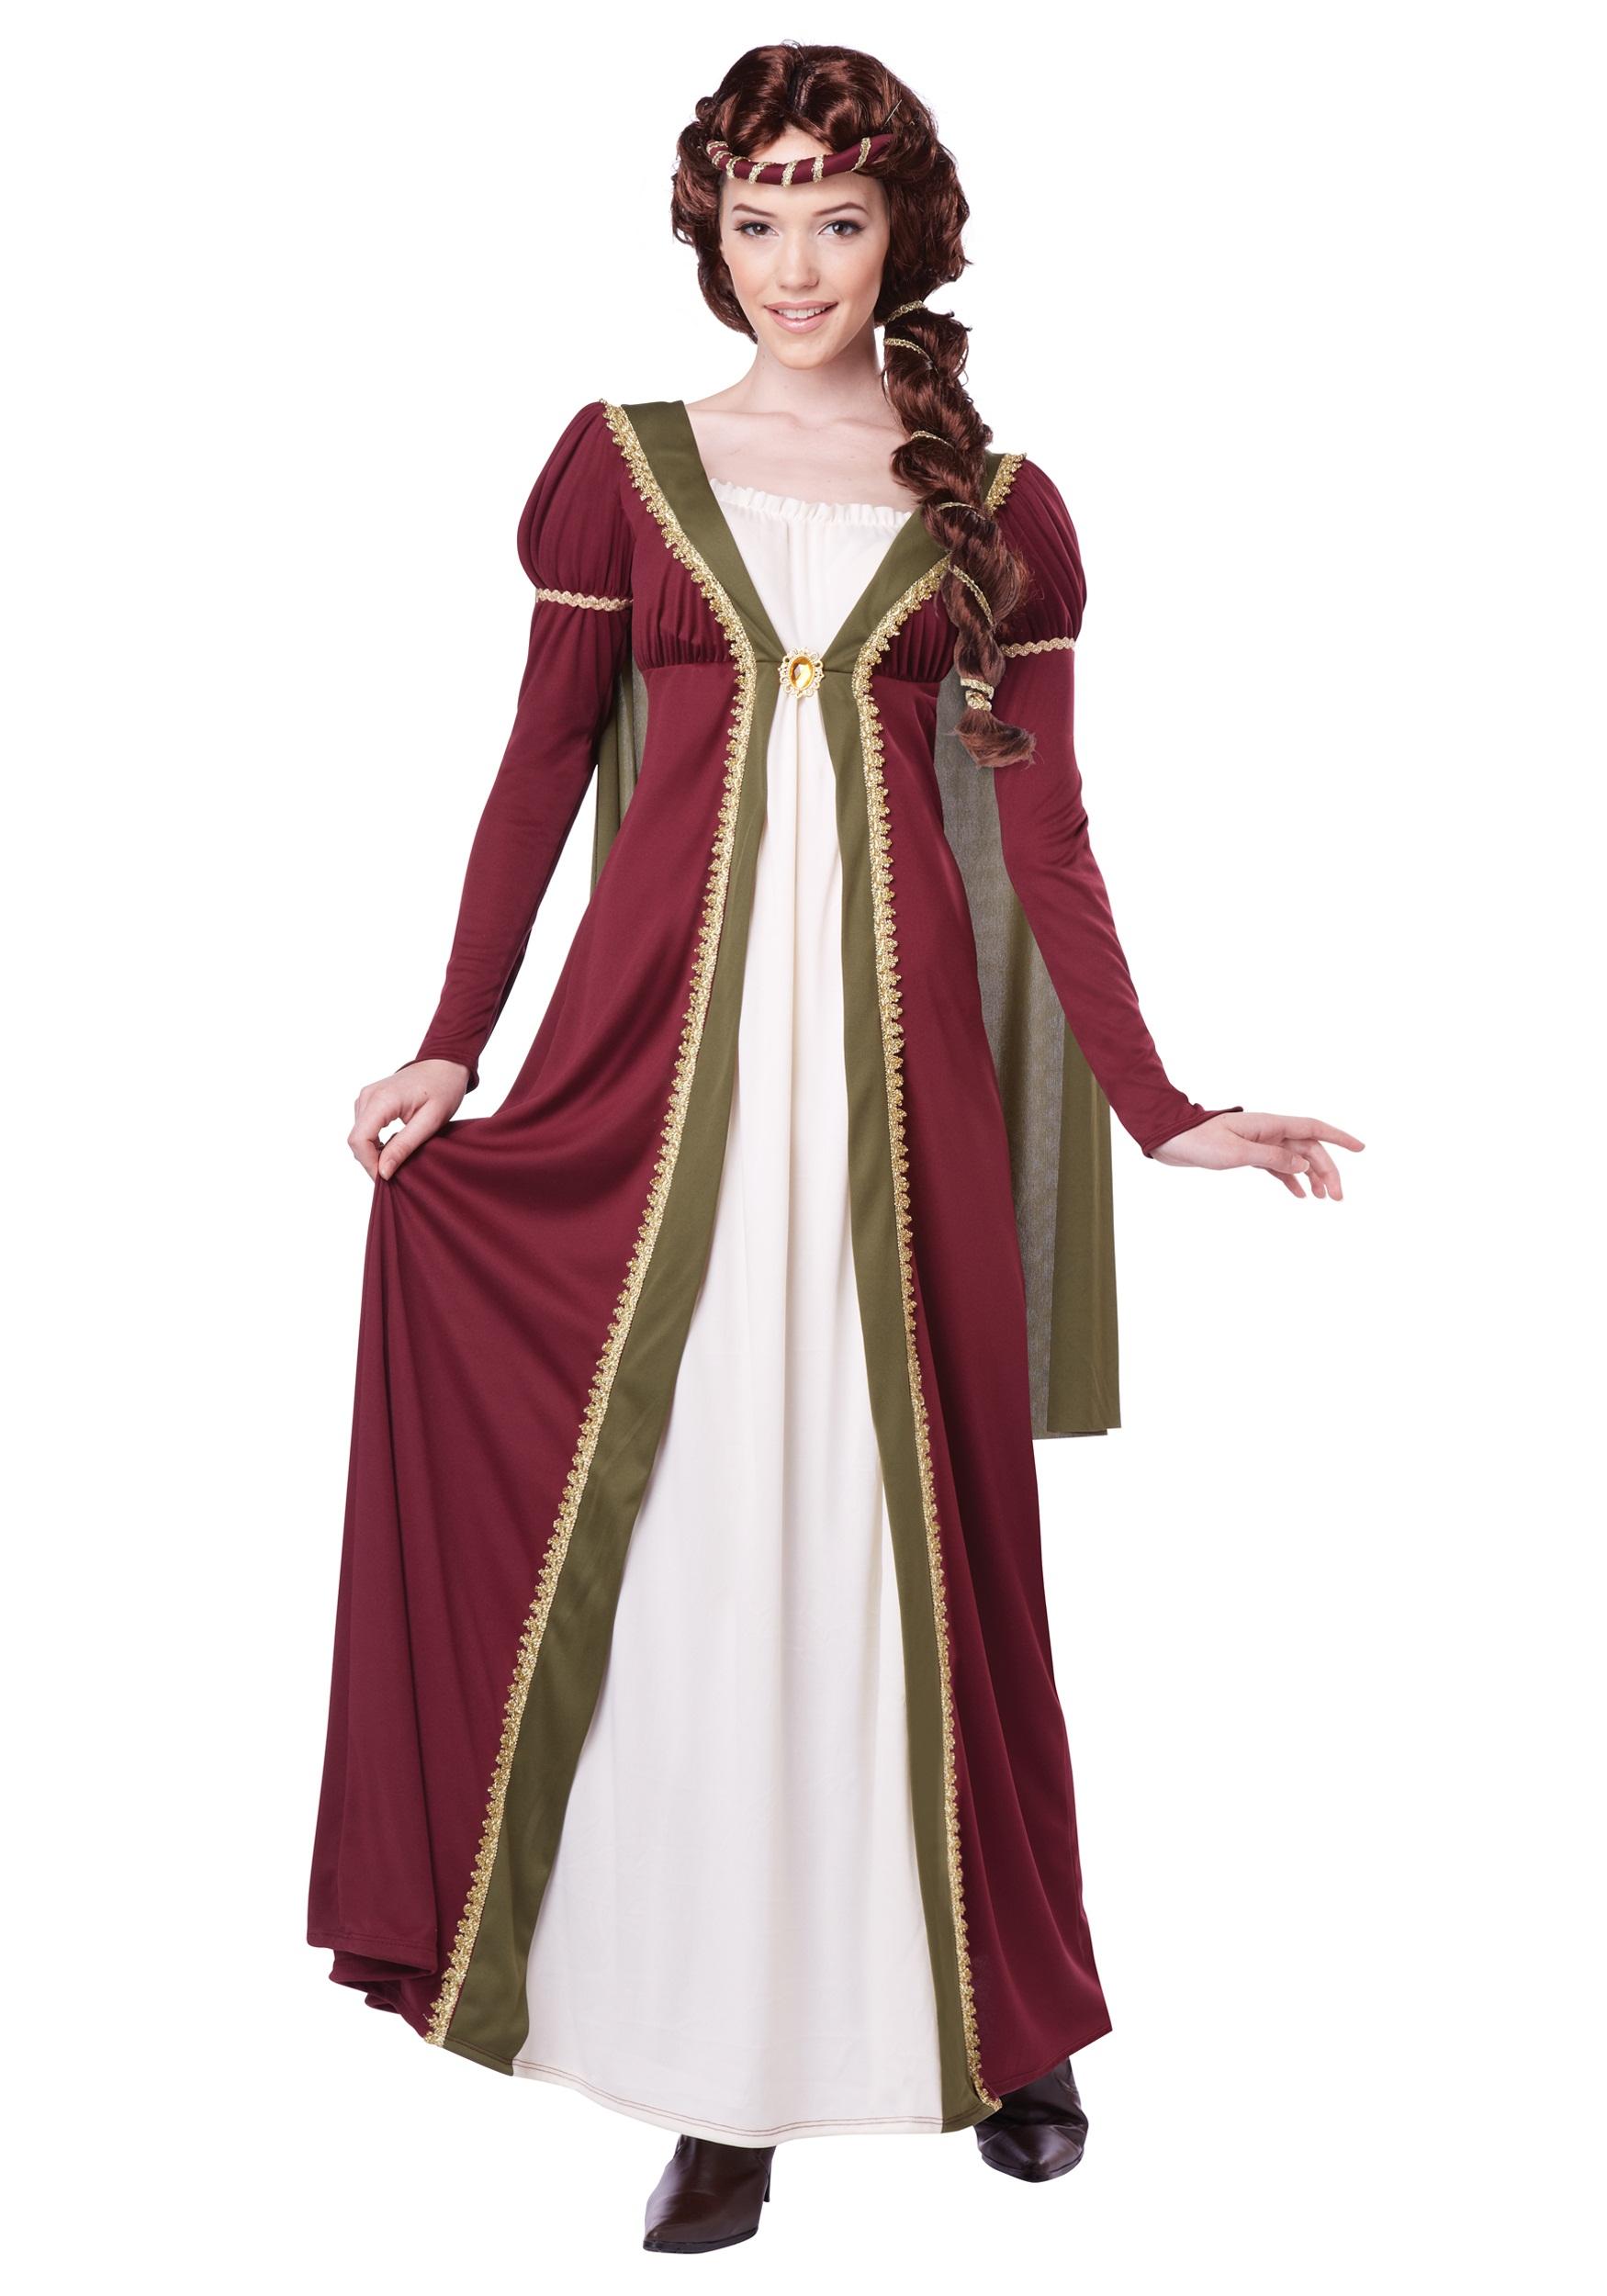 Renaissance Maiden Costume Adult Medieval Lady Halloween Fancy Dress